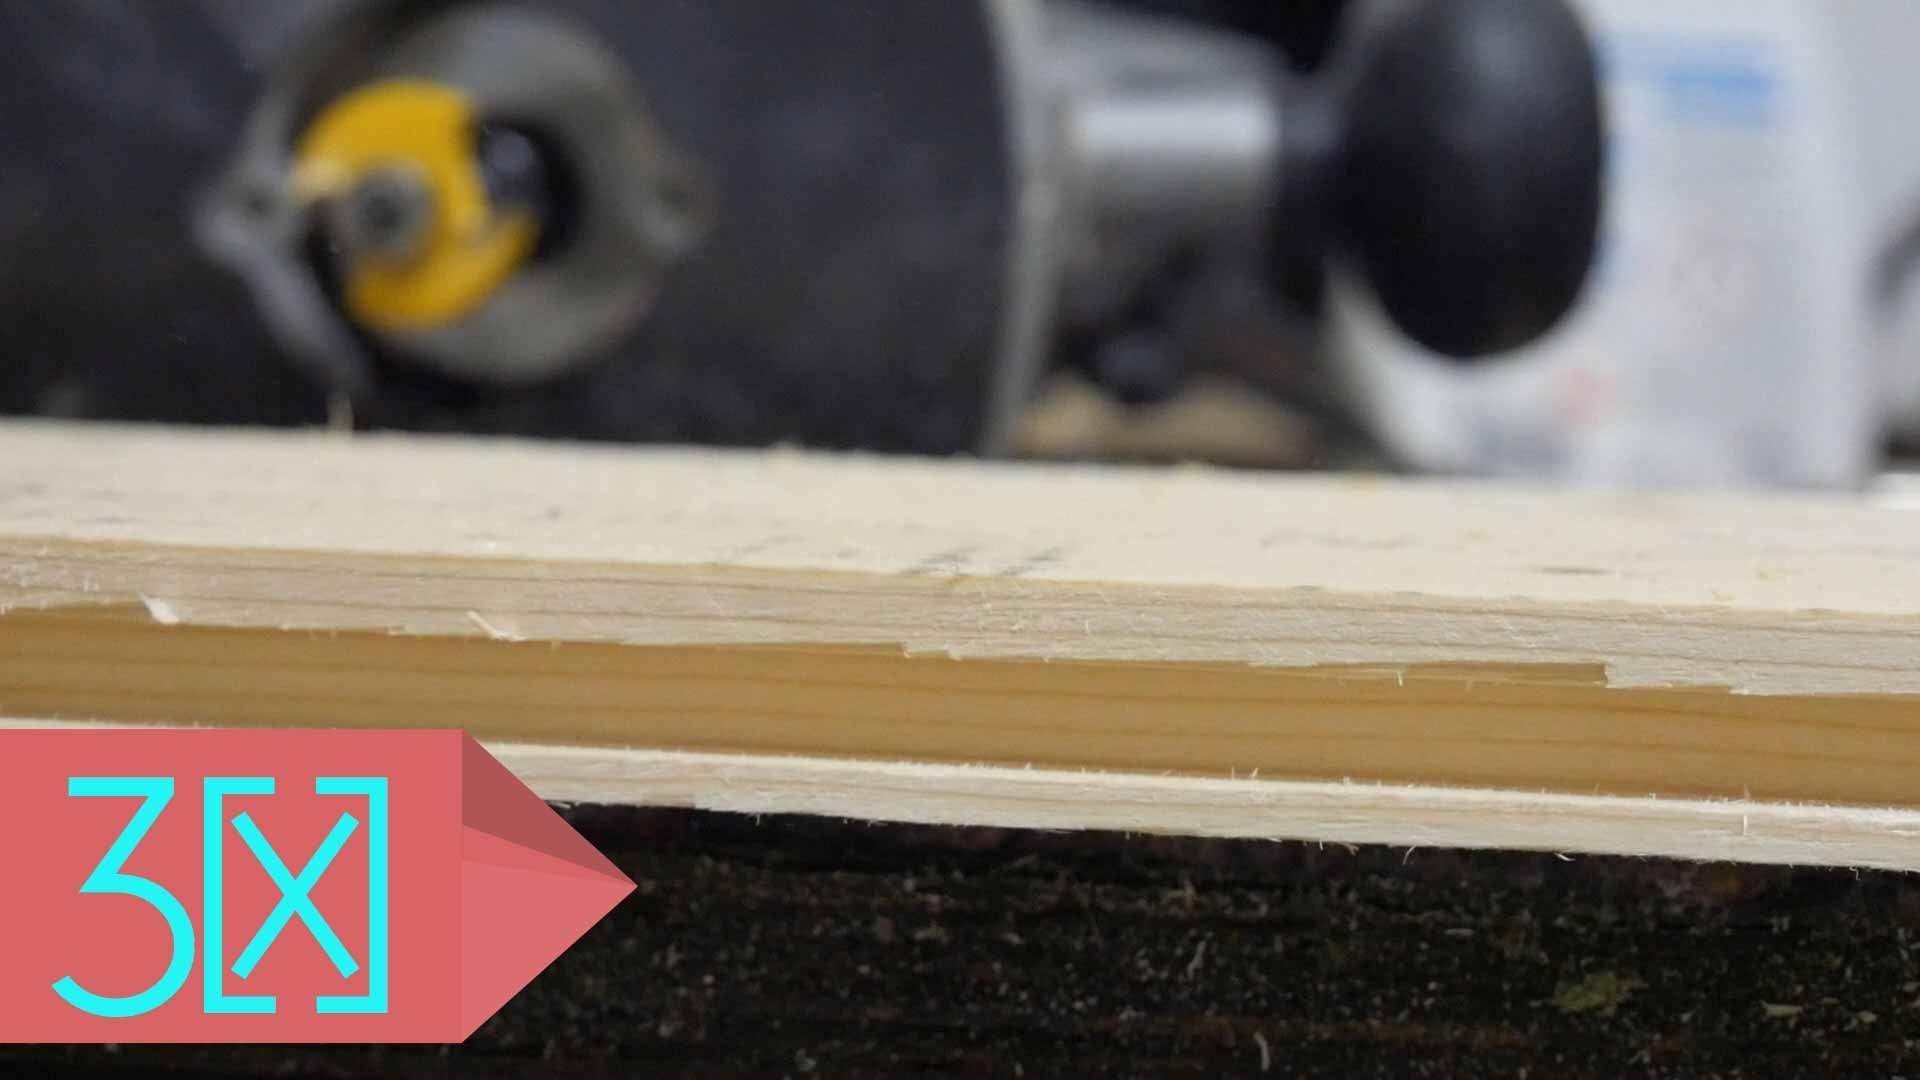 Oberfräse Tischplatte